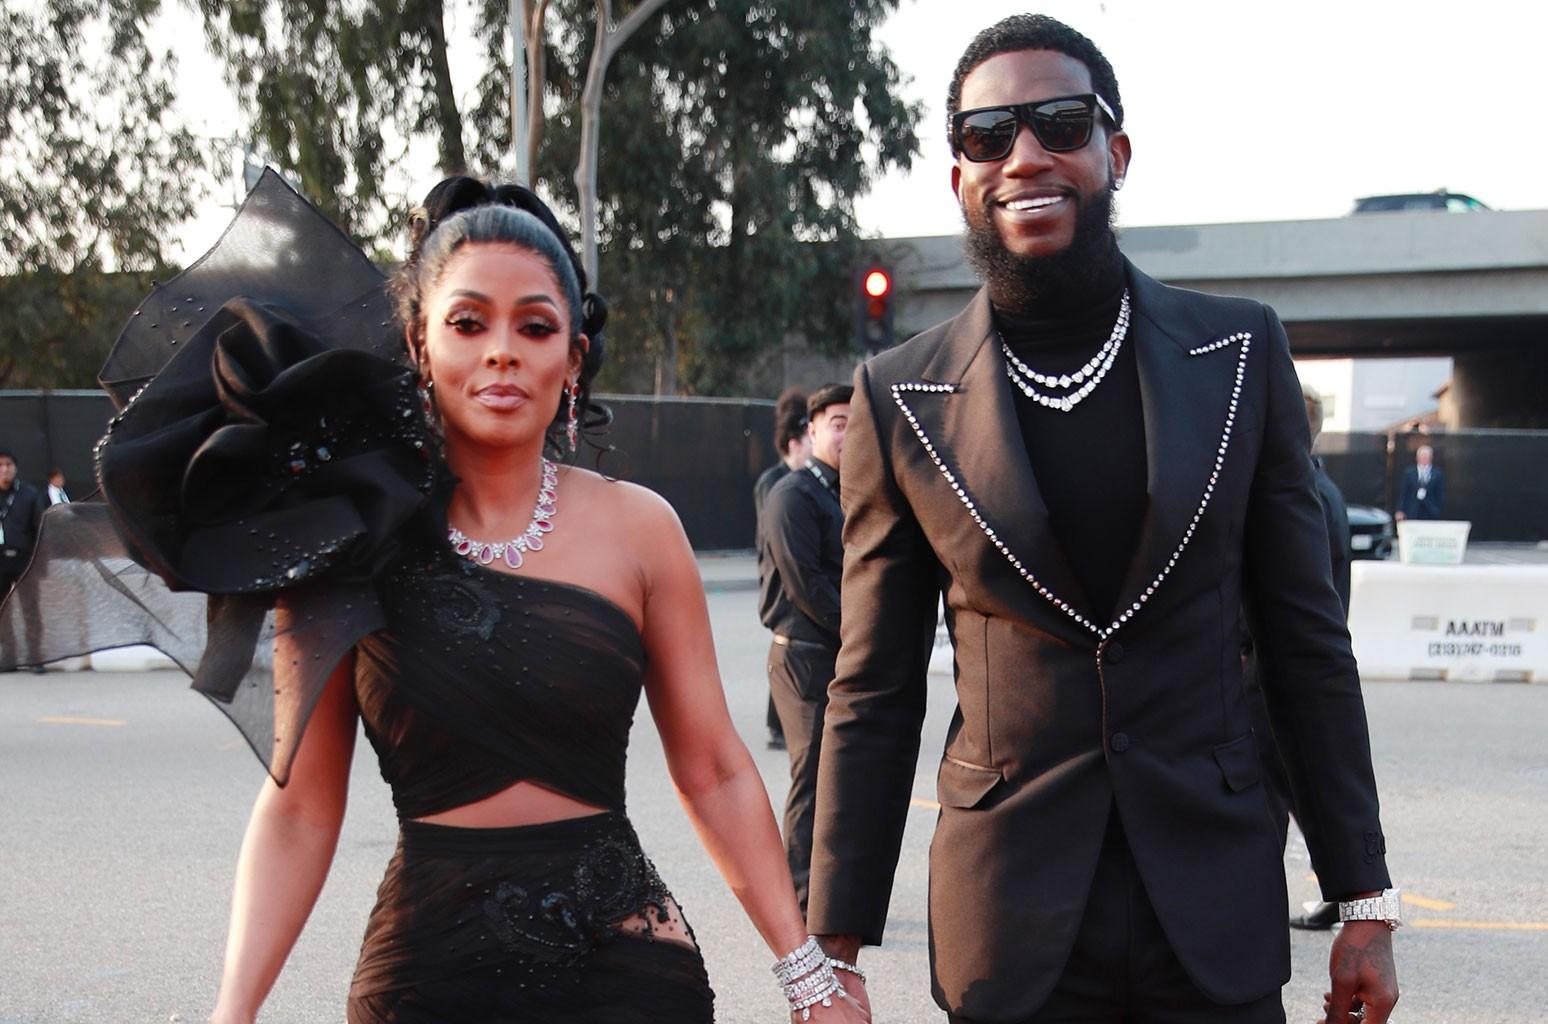 Gucci Mane and Wife Keyshia Ka'oir Welcome First Child Together: Ice Davis